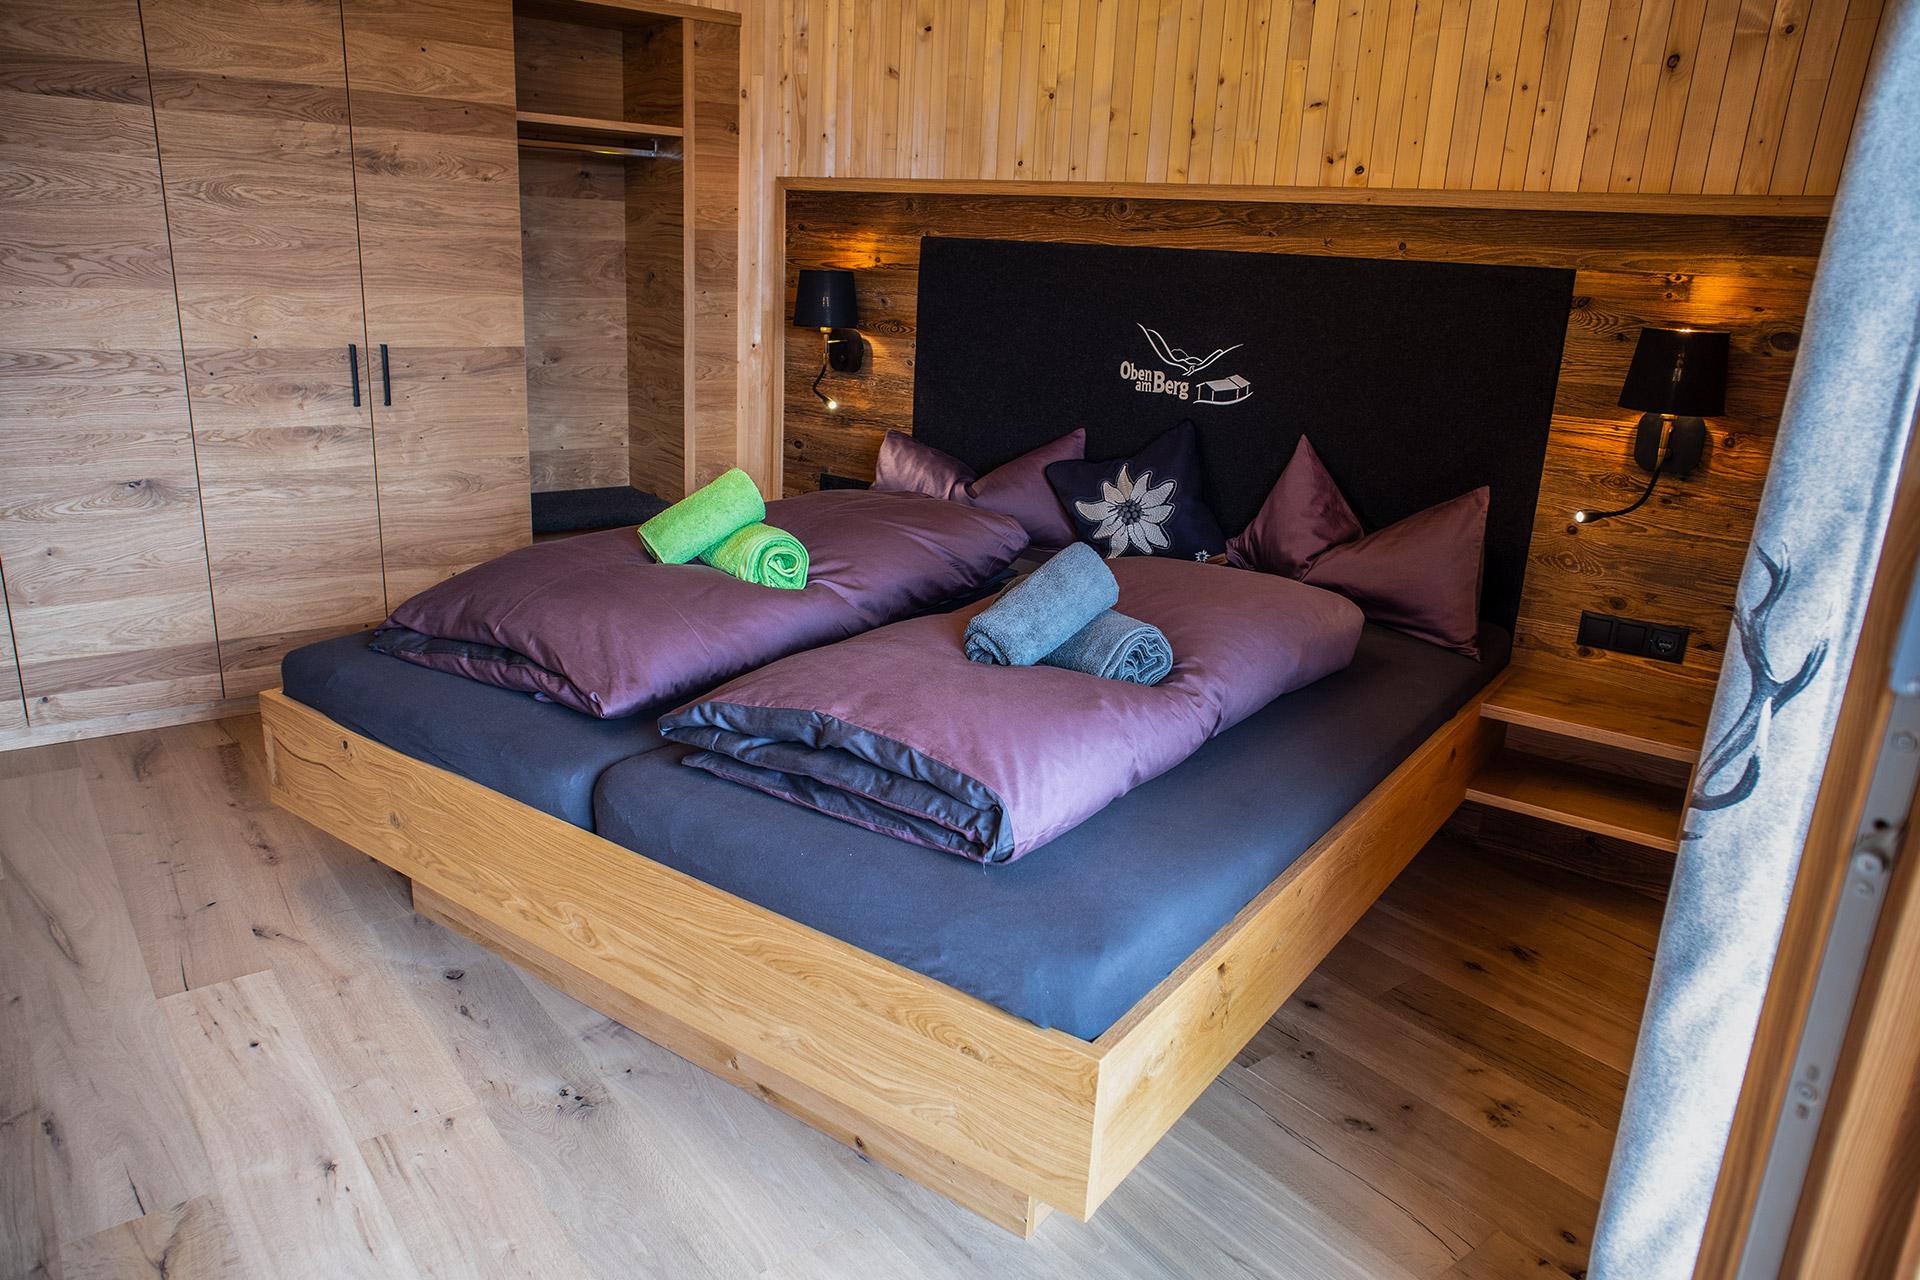 Schlafzimmer Gäsehaus Oben am Berg Balderschwang